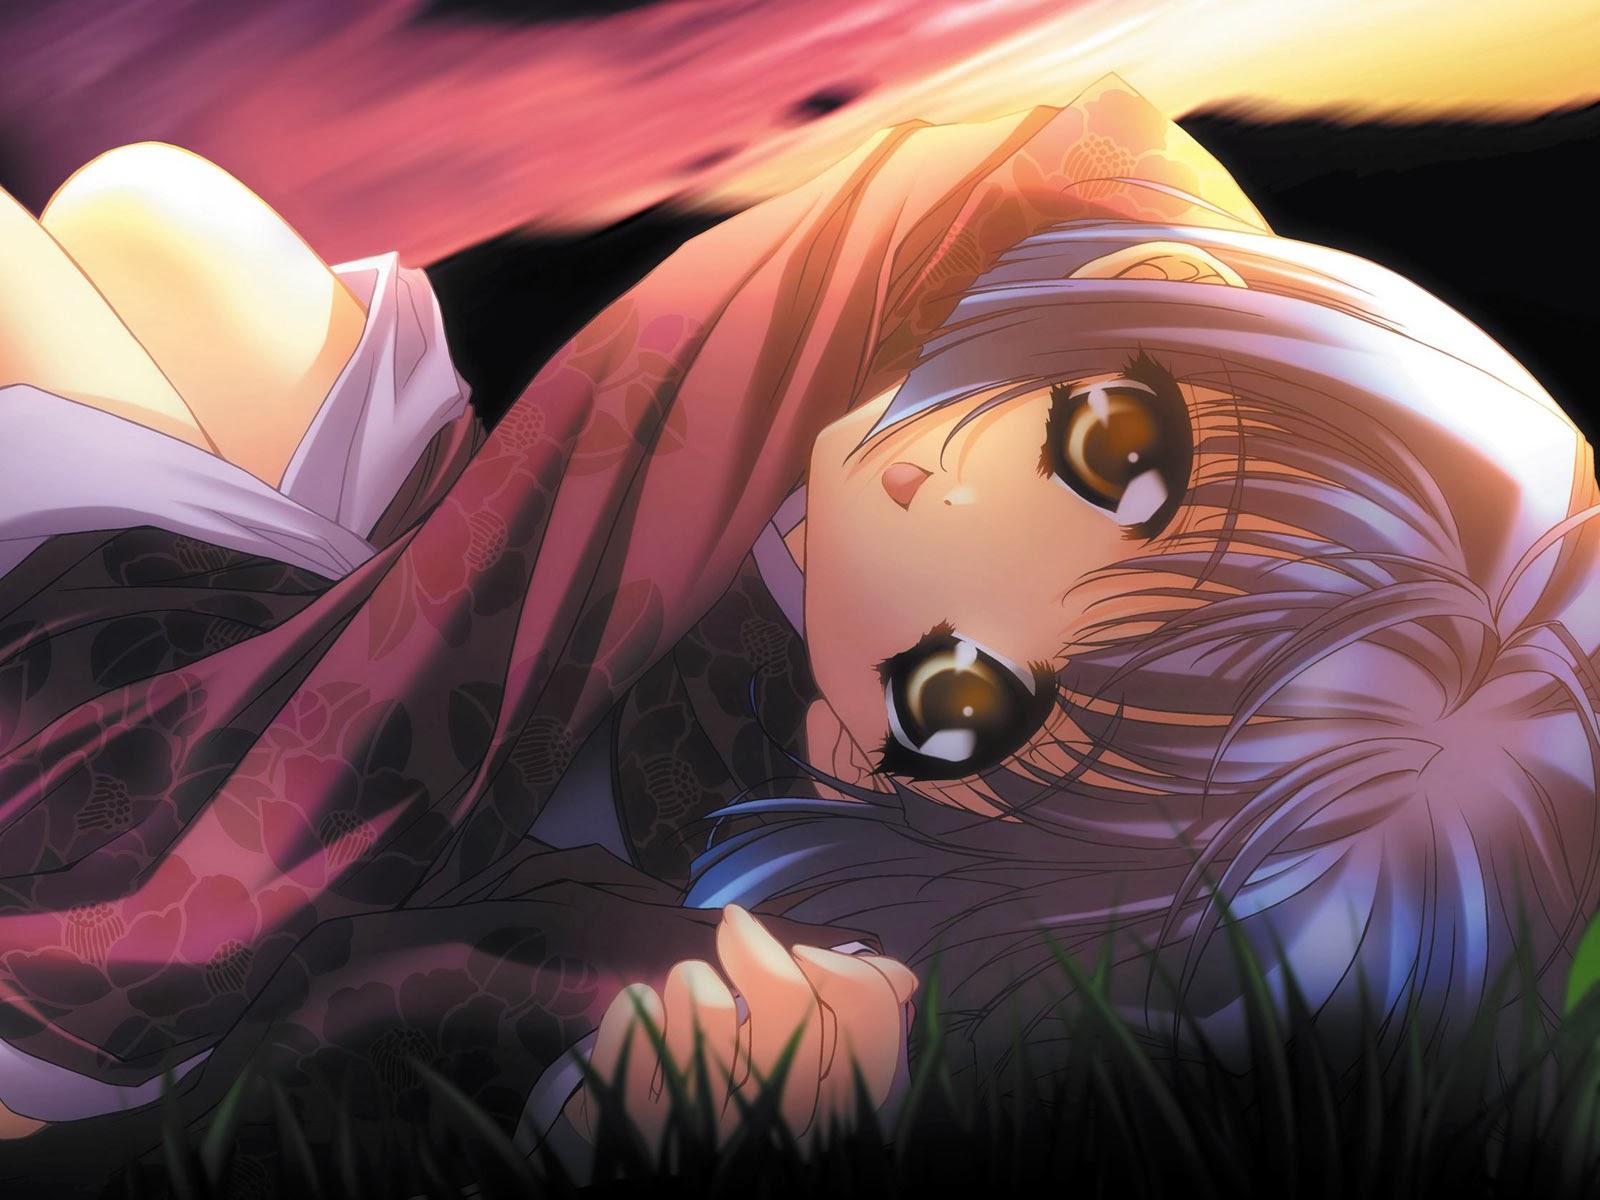 "<img src=""http://4.bp.blogspot.com/-ZSLSYM0z9bA/Utvg8WPSU1I/AAAAAAAAJEc/y0_KTVVk6Ts/s1600/anime-girl.jpg"" alt=""anime girl"" />"